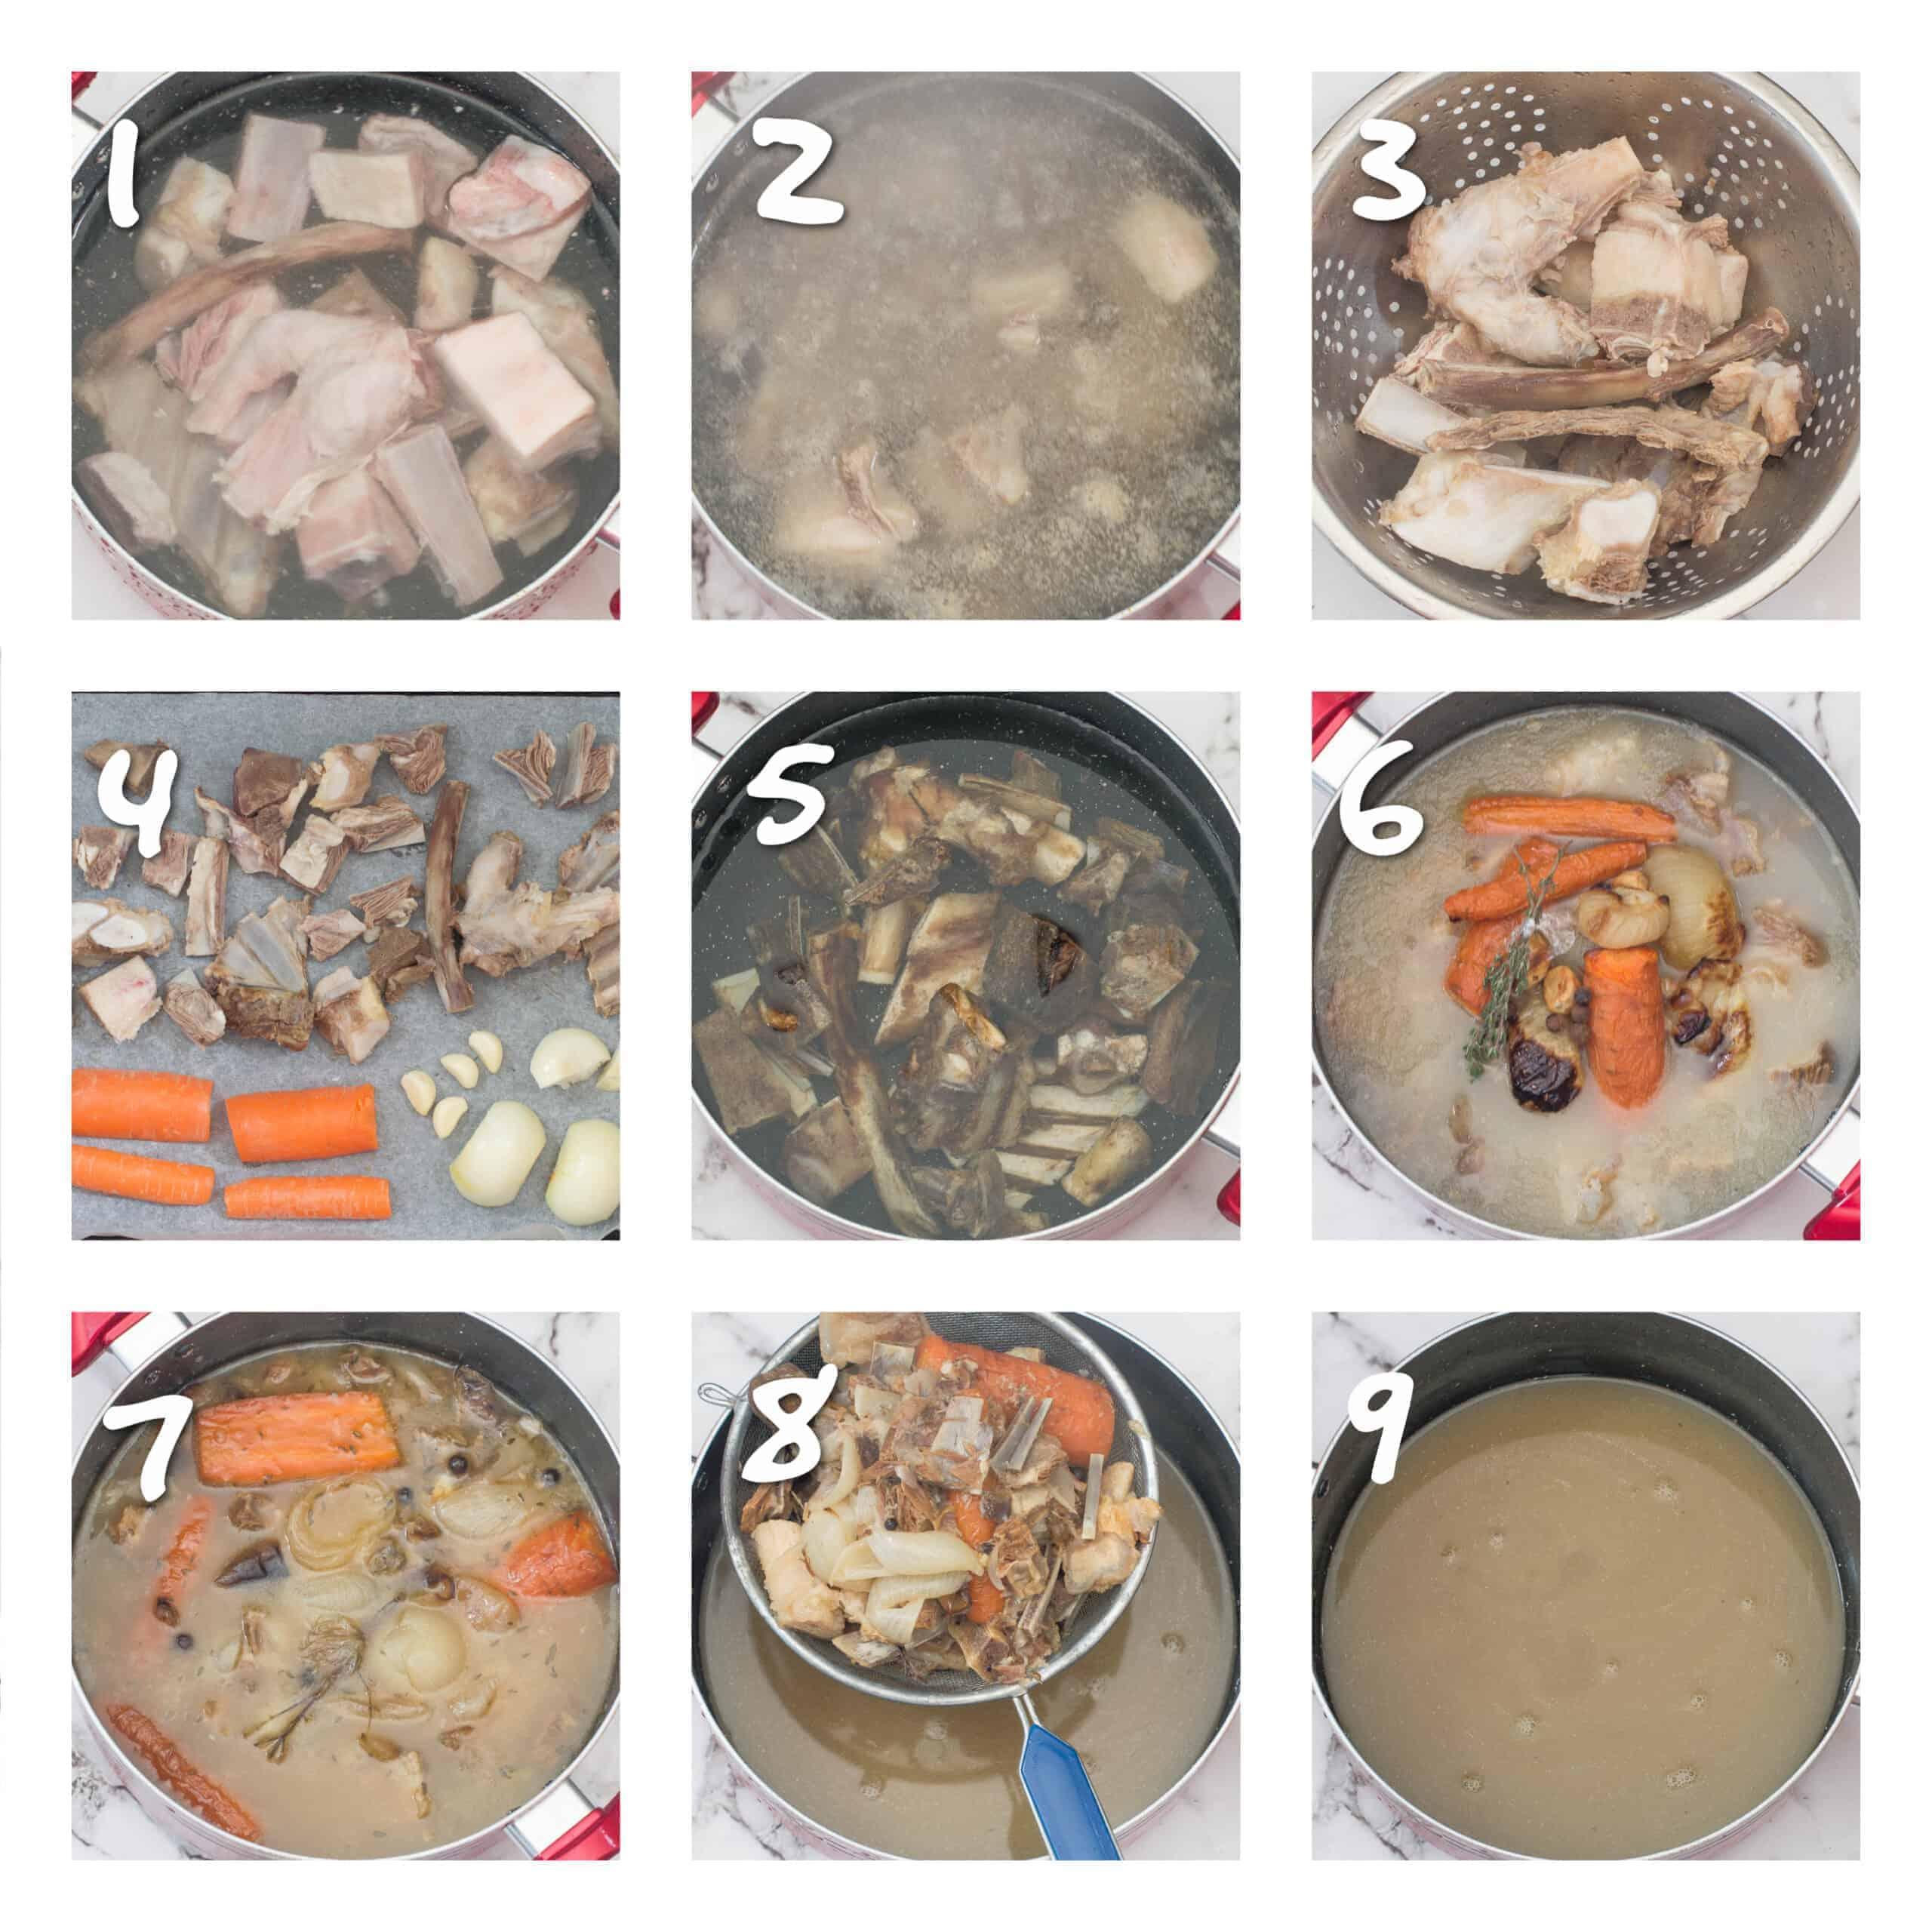 steps1-9 boiling bones and vegetables for stock